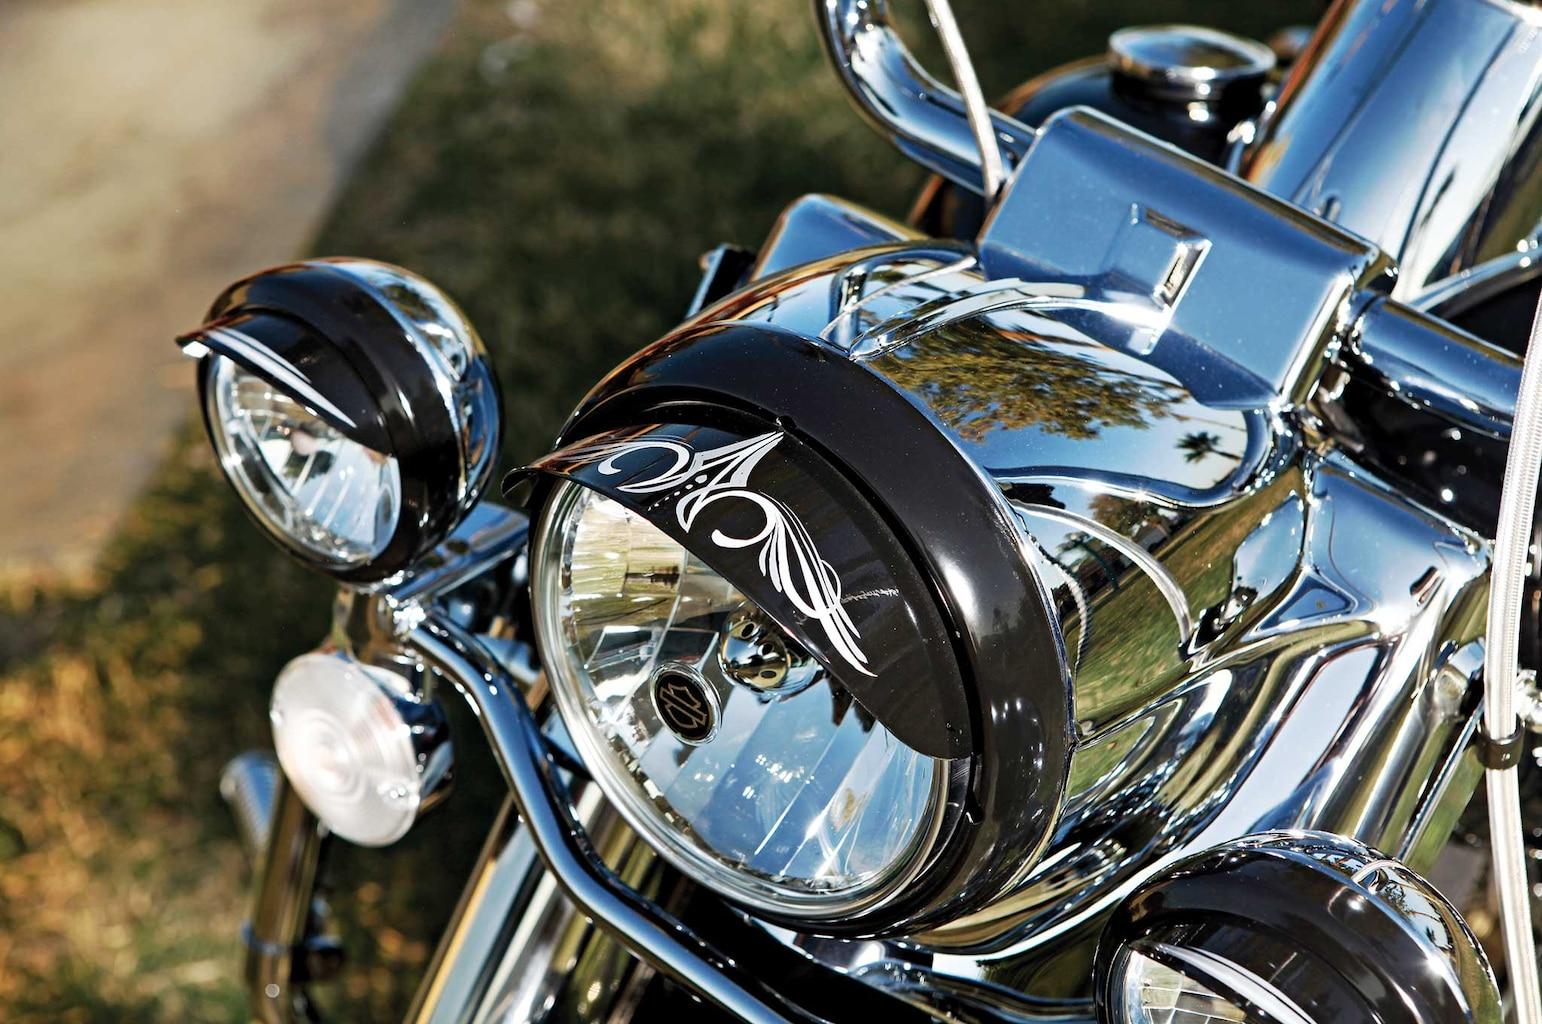 002 2012 harley davidson road king headlight